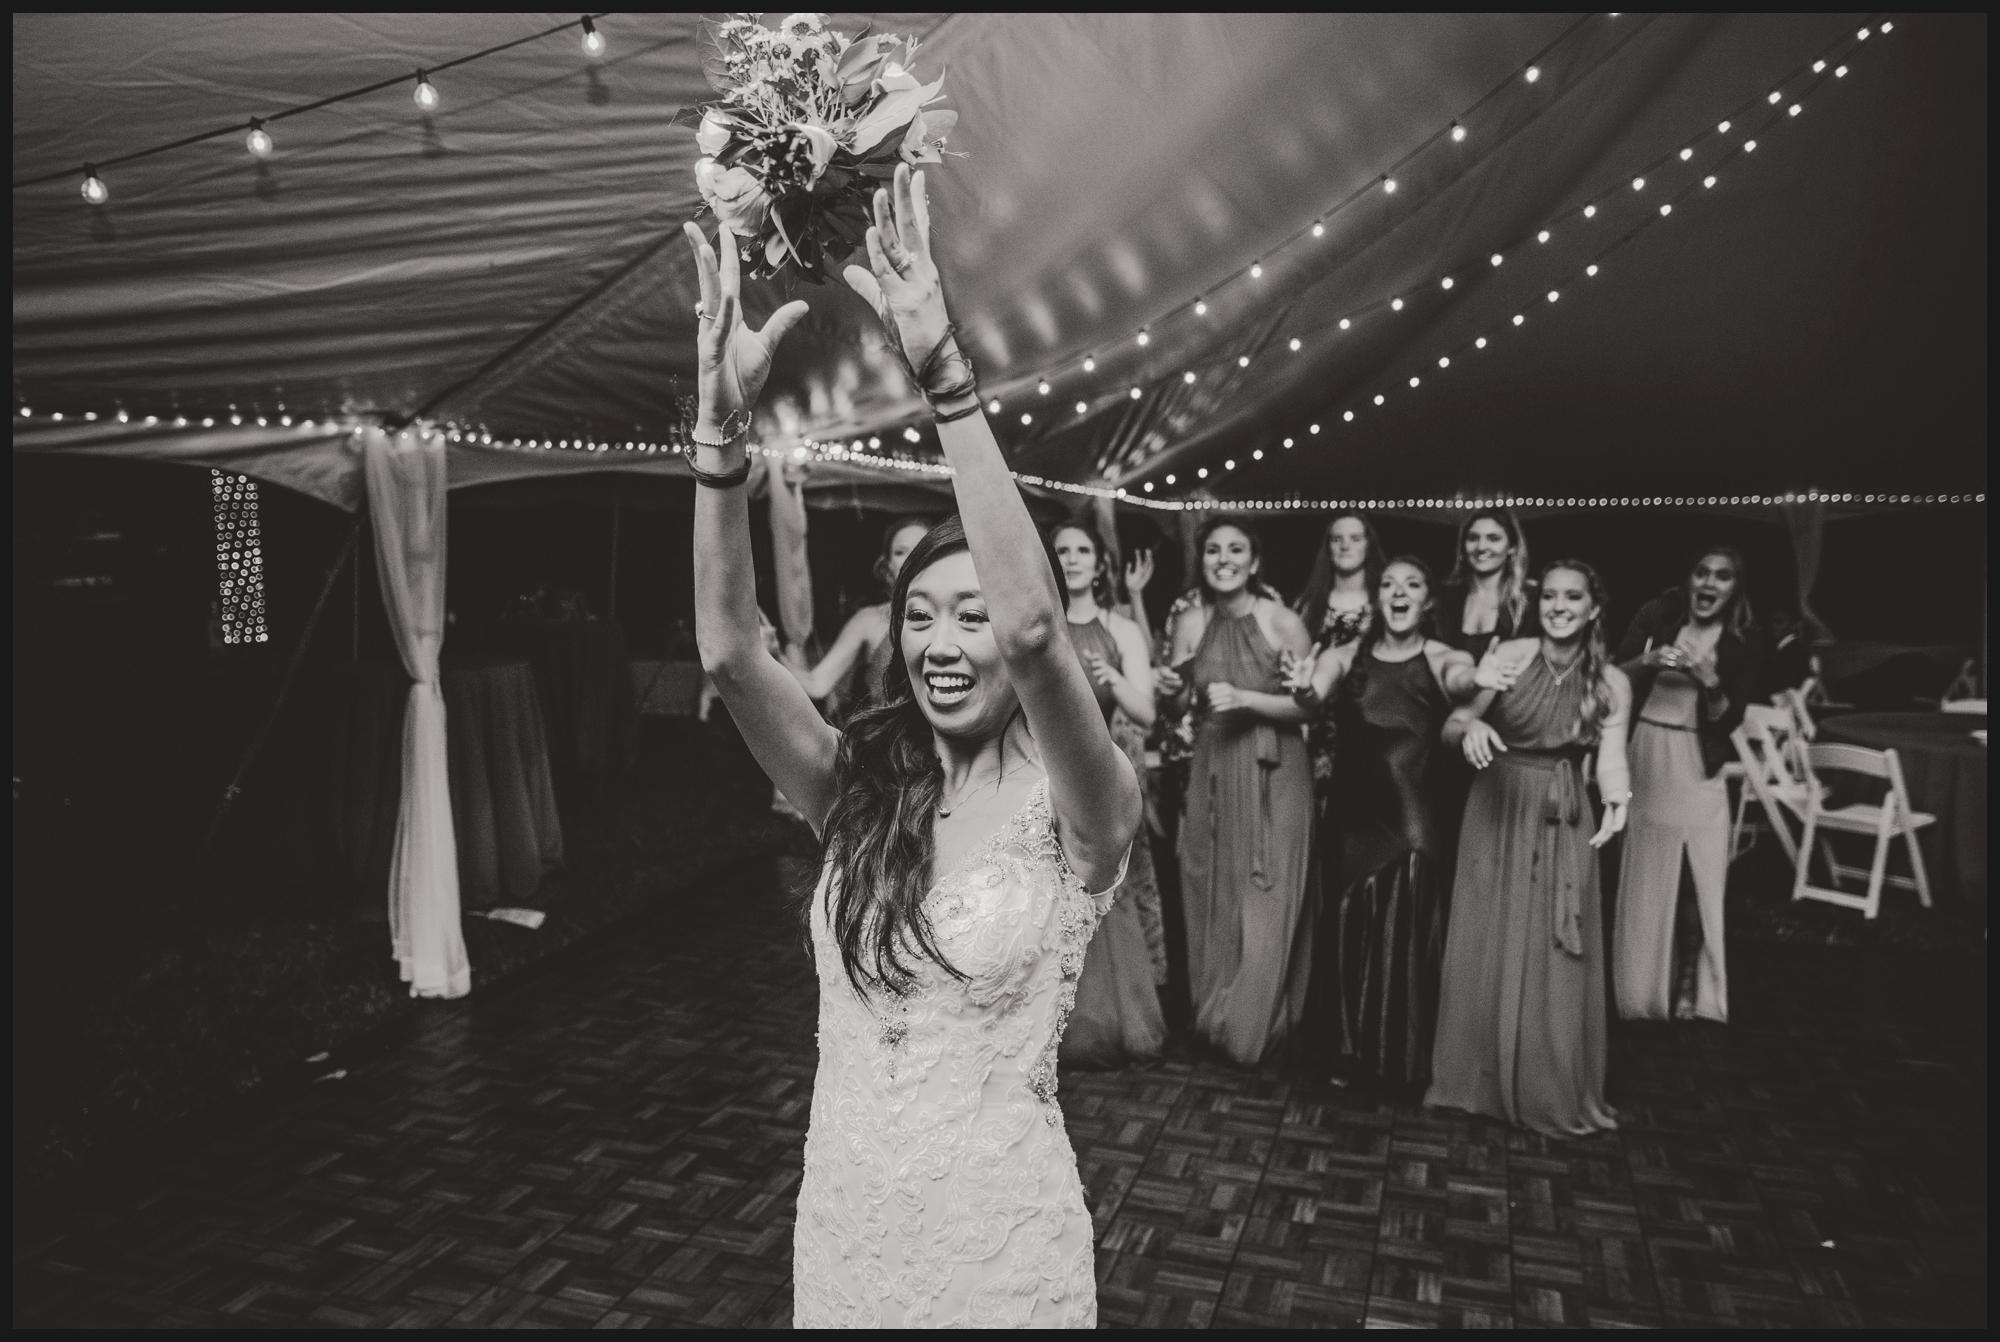 Orlando-Wedding-Photographer-destination-wedding-photographer-florida-wedding-photographer-bohemian-wedding-photographer_1453.jpg